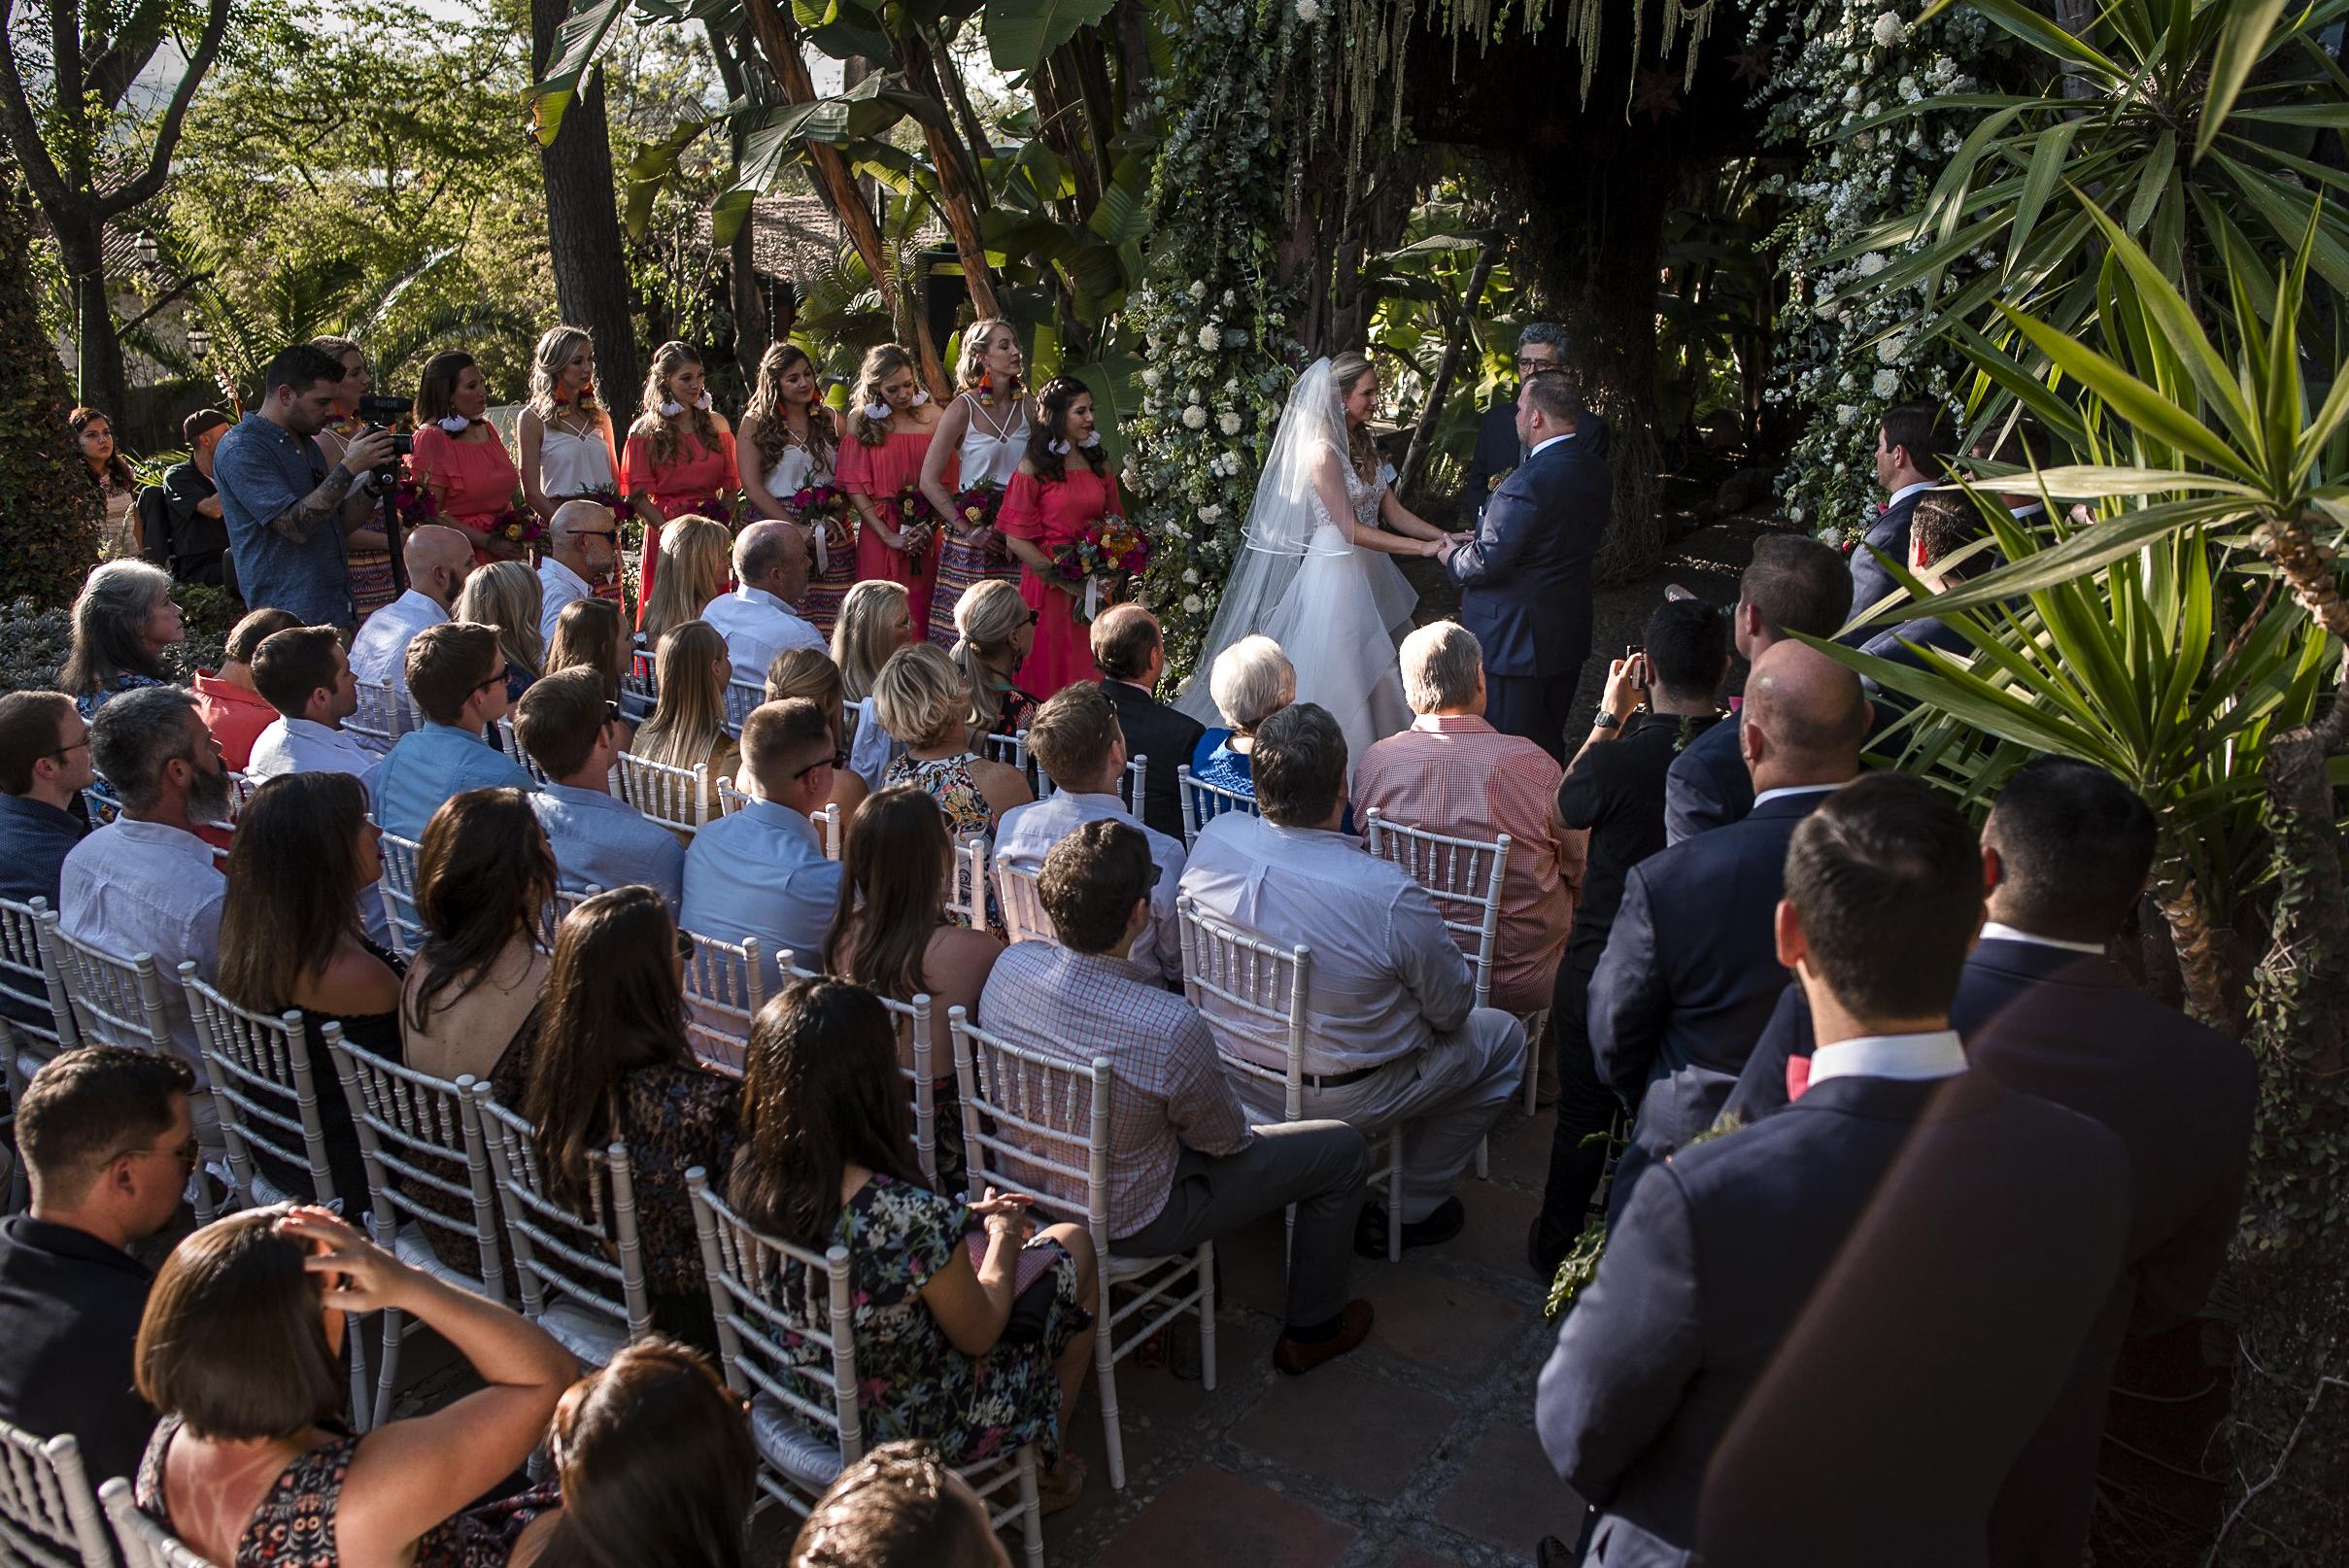 casa_chorro_wedding_san_miguel_de_allende_chio_garcia_photographer (16).jpg